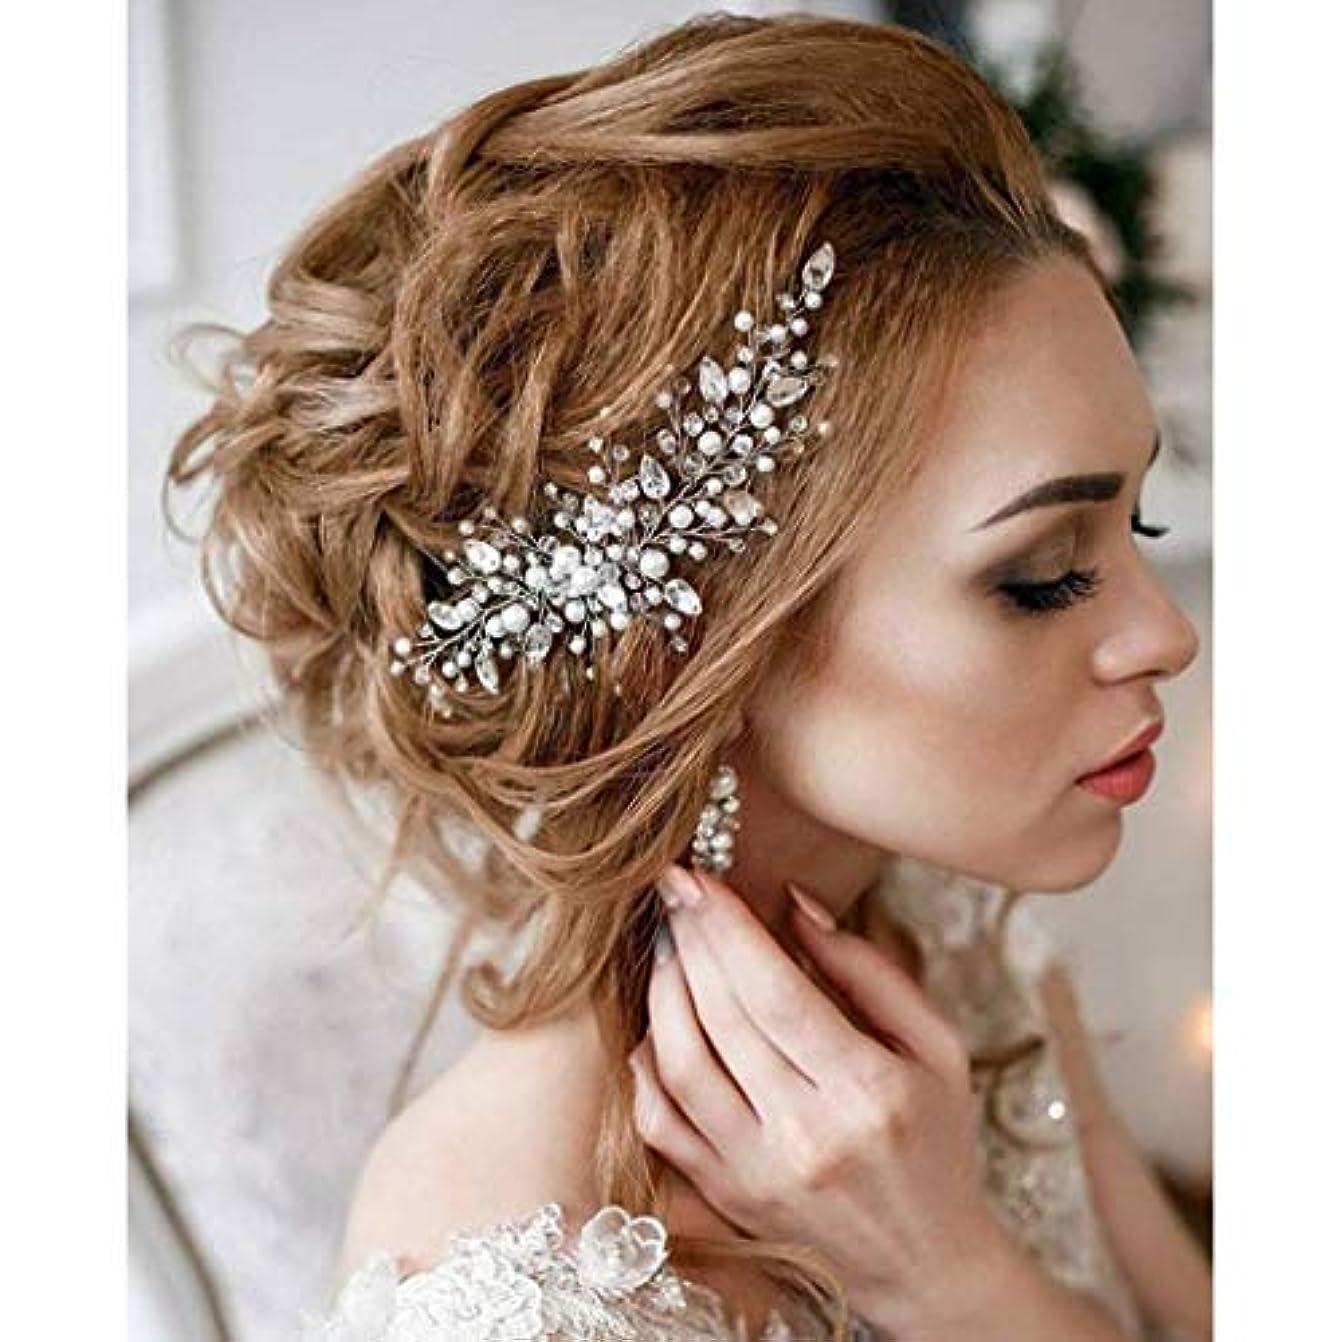 Aukmla Bride Wedding Hair Combs Bridal Hair Accessories Decorative for Brides and Bridesmaids [並行輸入品]